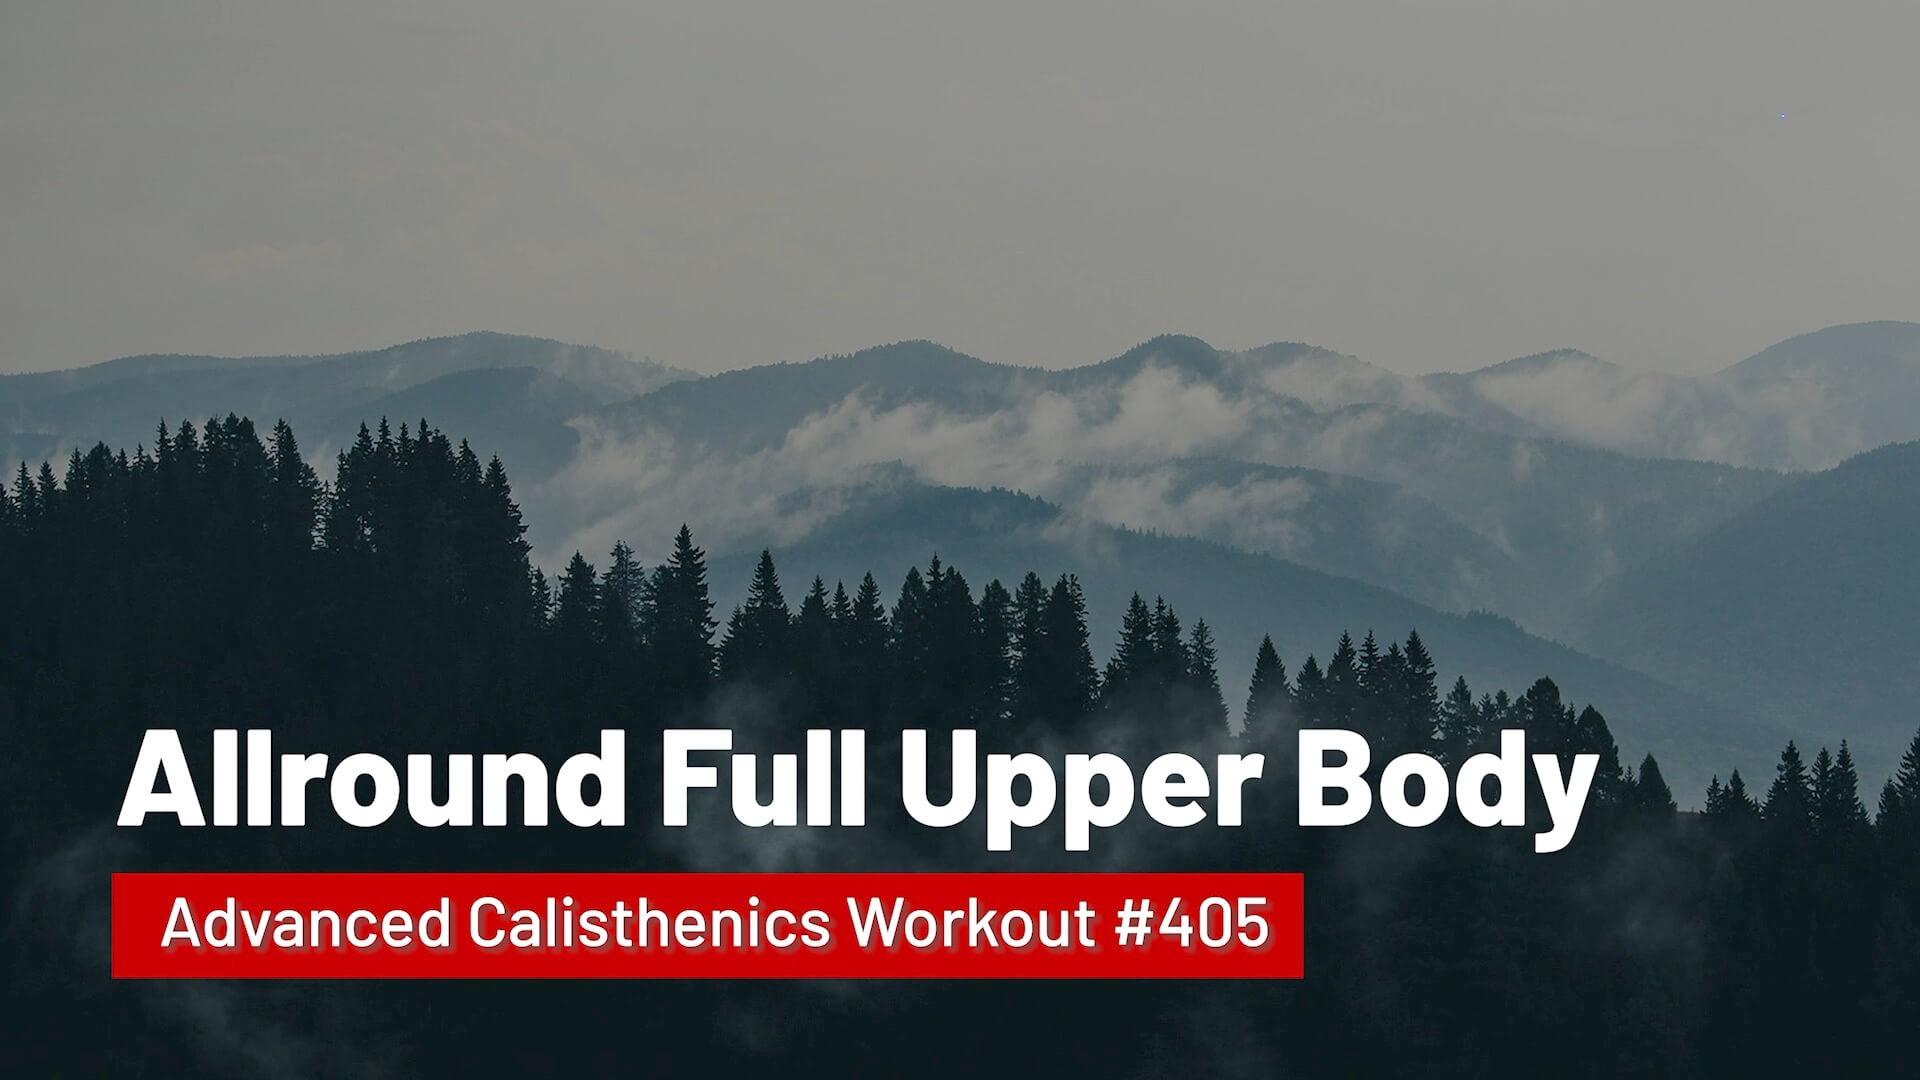 Workout #405